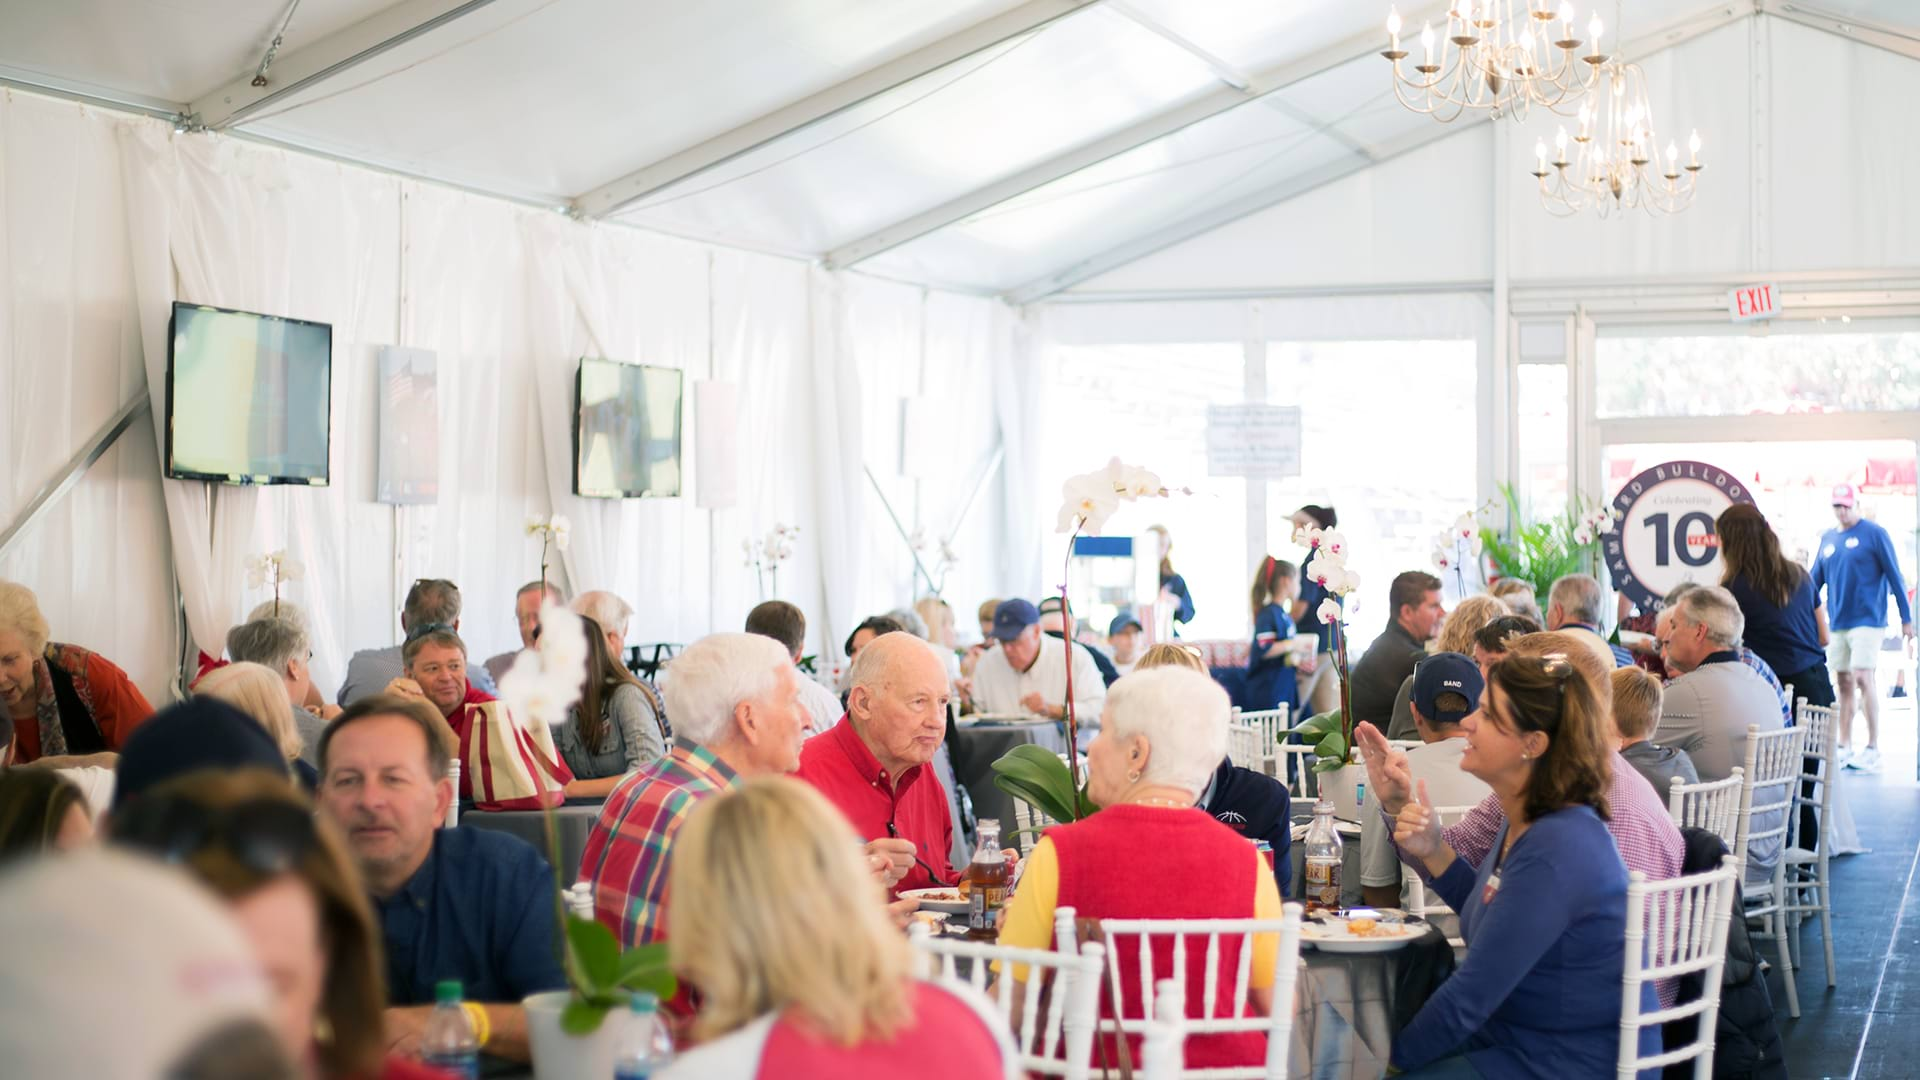 https://www.samford.edu/departments/images/Event-Planning/Bulldog-Club-Hospitality-Tent.jpg